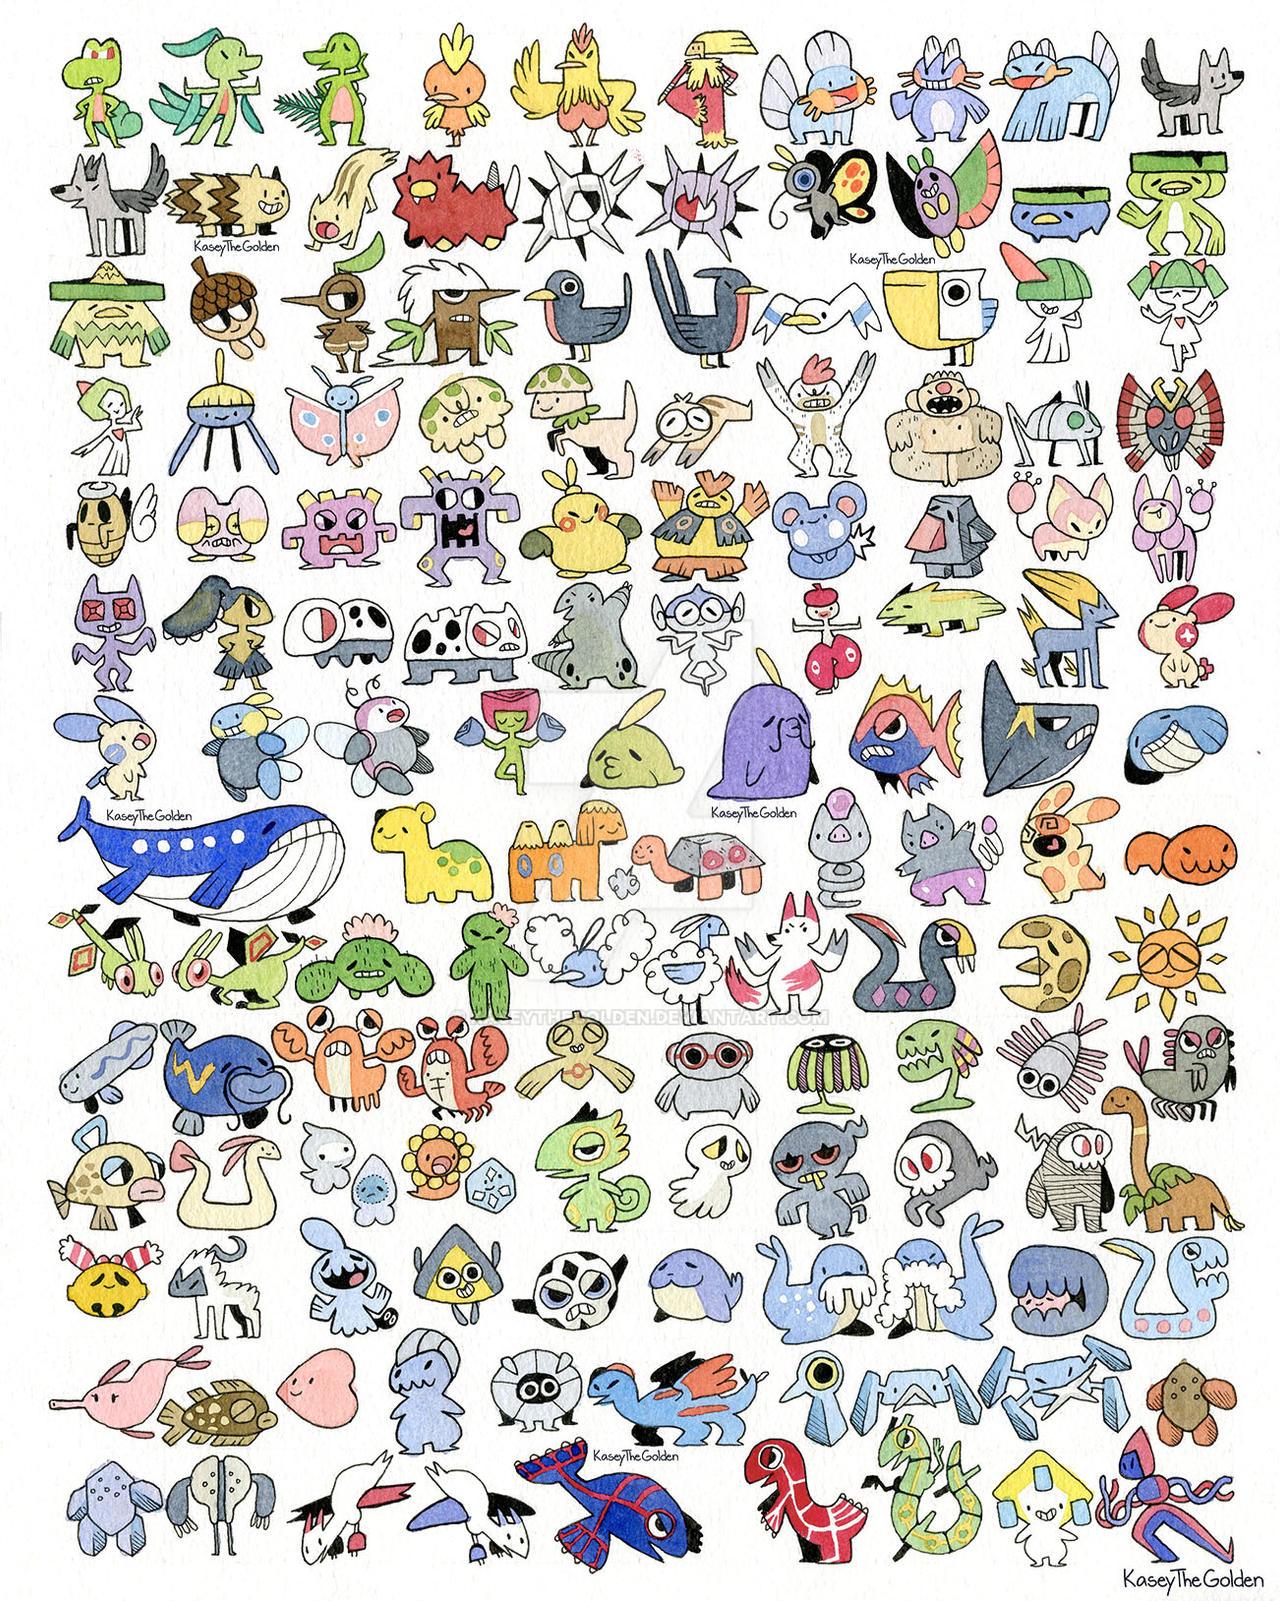 Pokemon 3 Generation